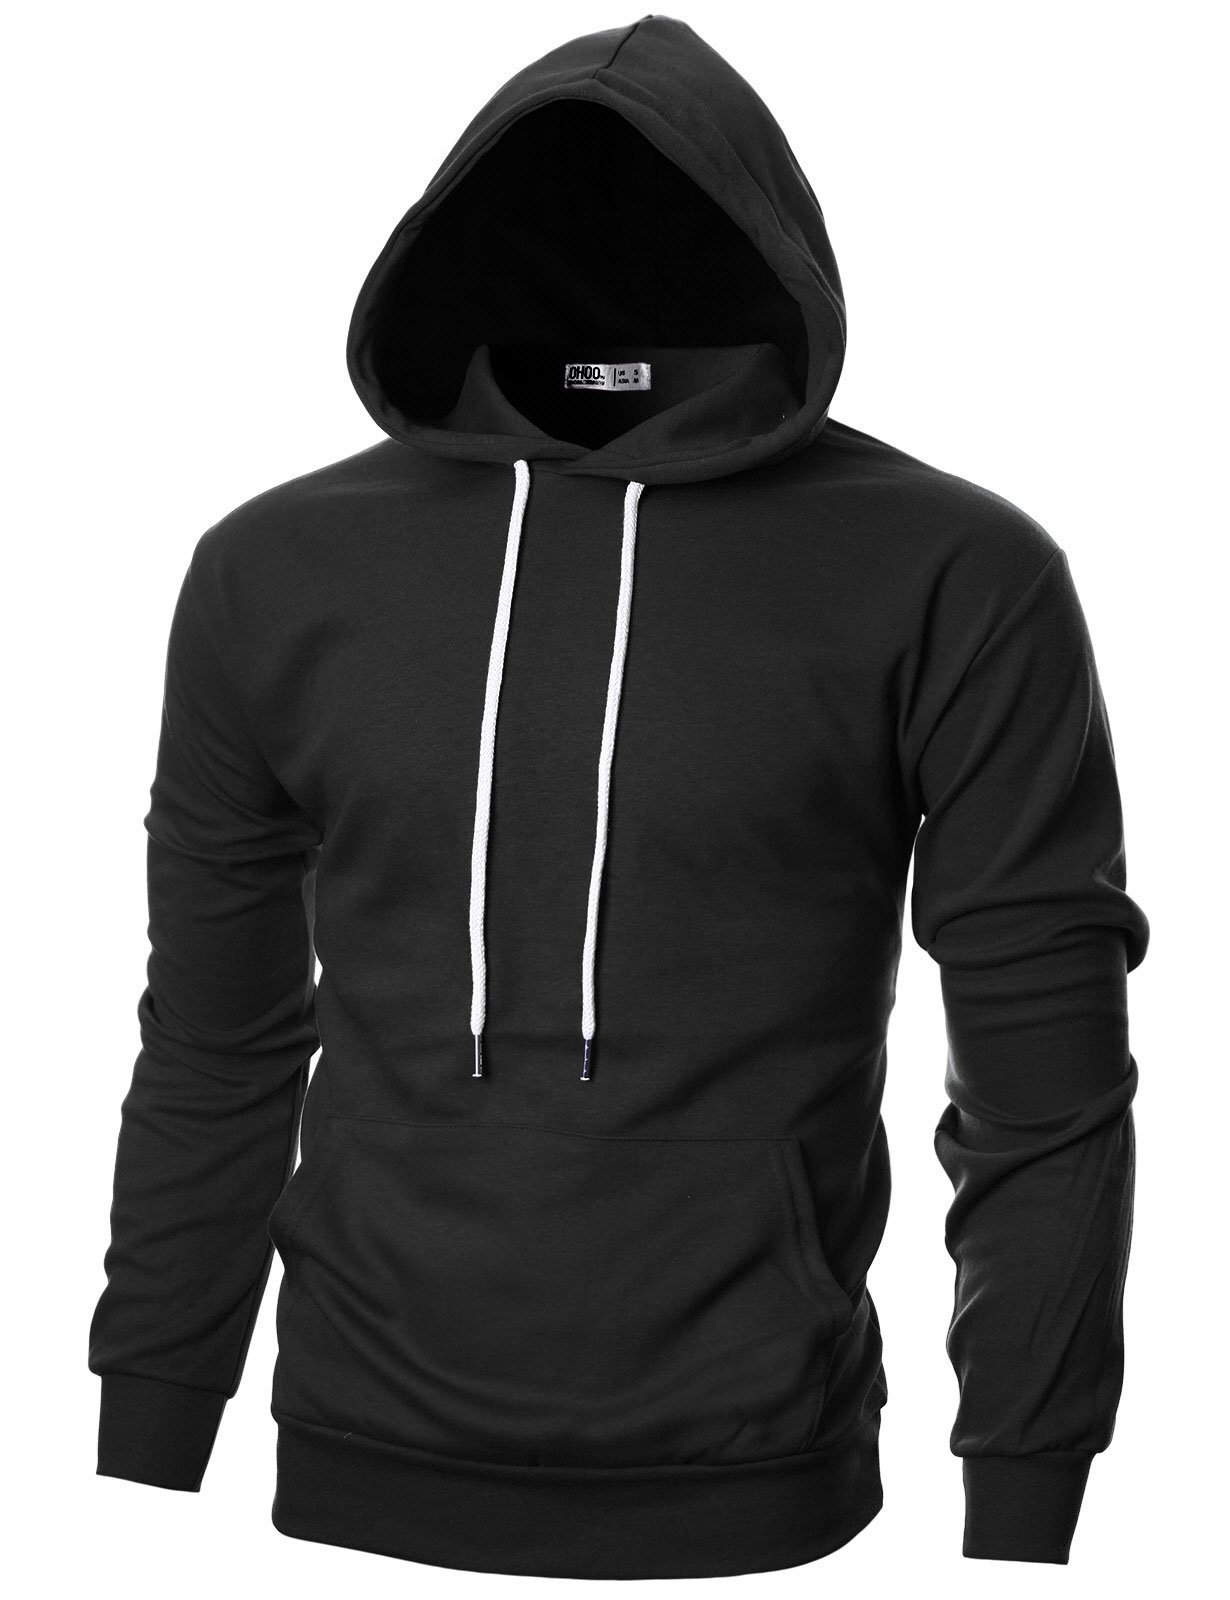 Ohoo Mens Slim Fit Long Sleeve Lightweight Hoodie with Kanga Pocket/DCF010-BLACK-L